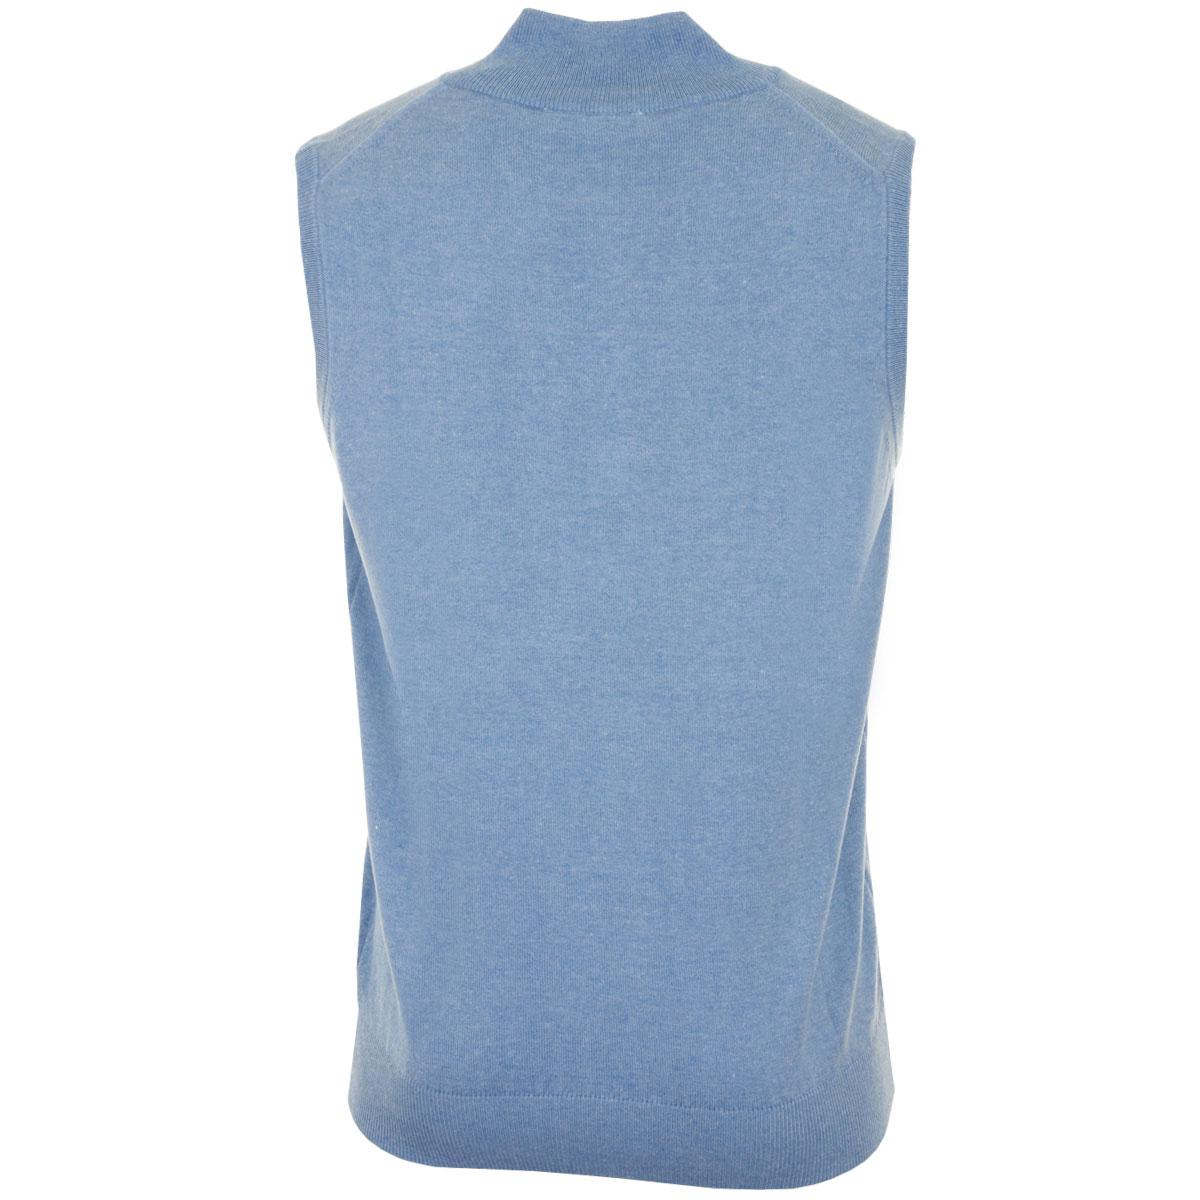 Calvin-Klein-Golf-Mens-CK-1-4-Zip-Sleeveless-Sweater-Vest-Gilet-27-OFF-RRP thumbnail 33